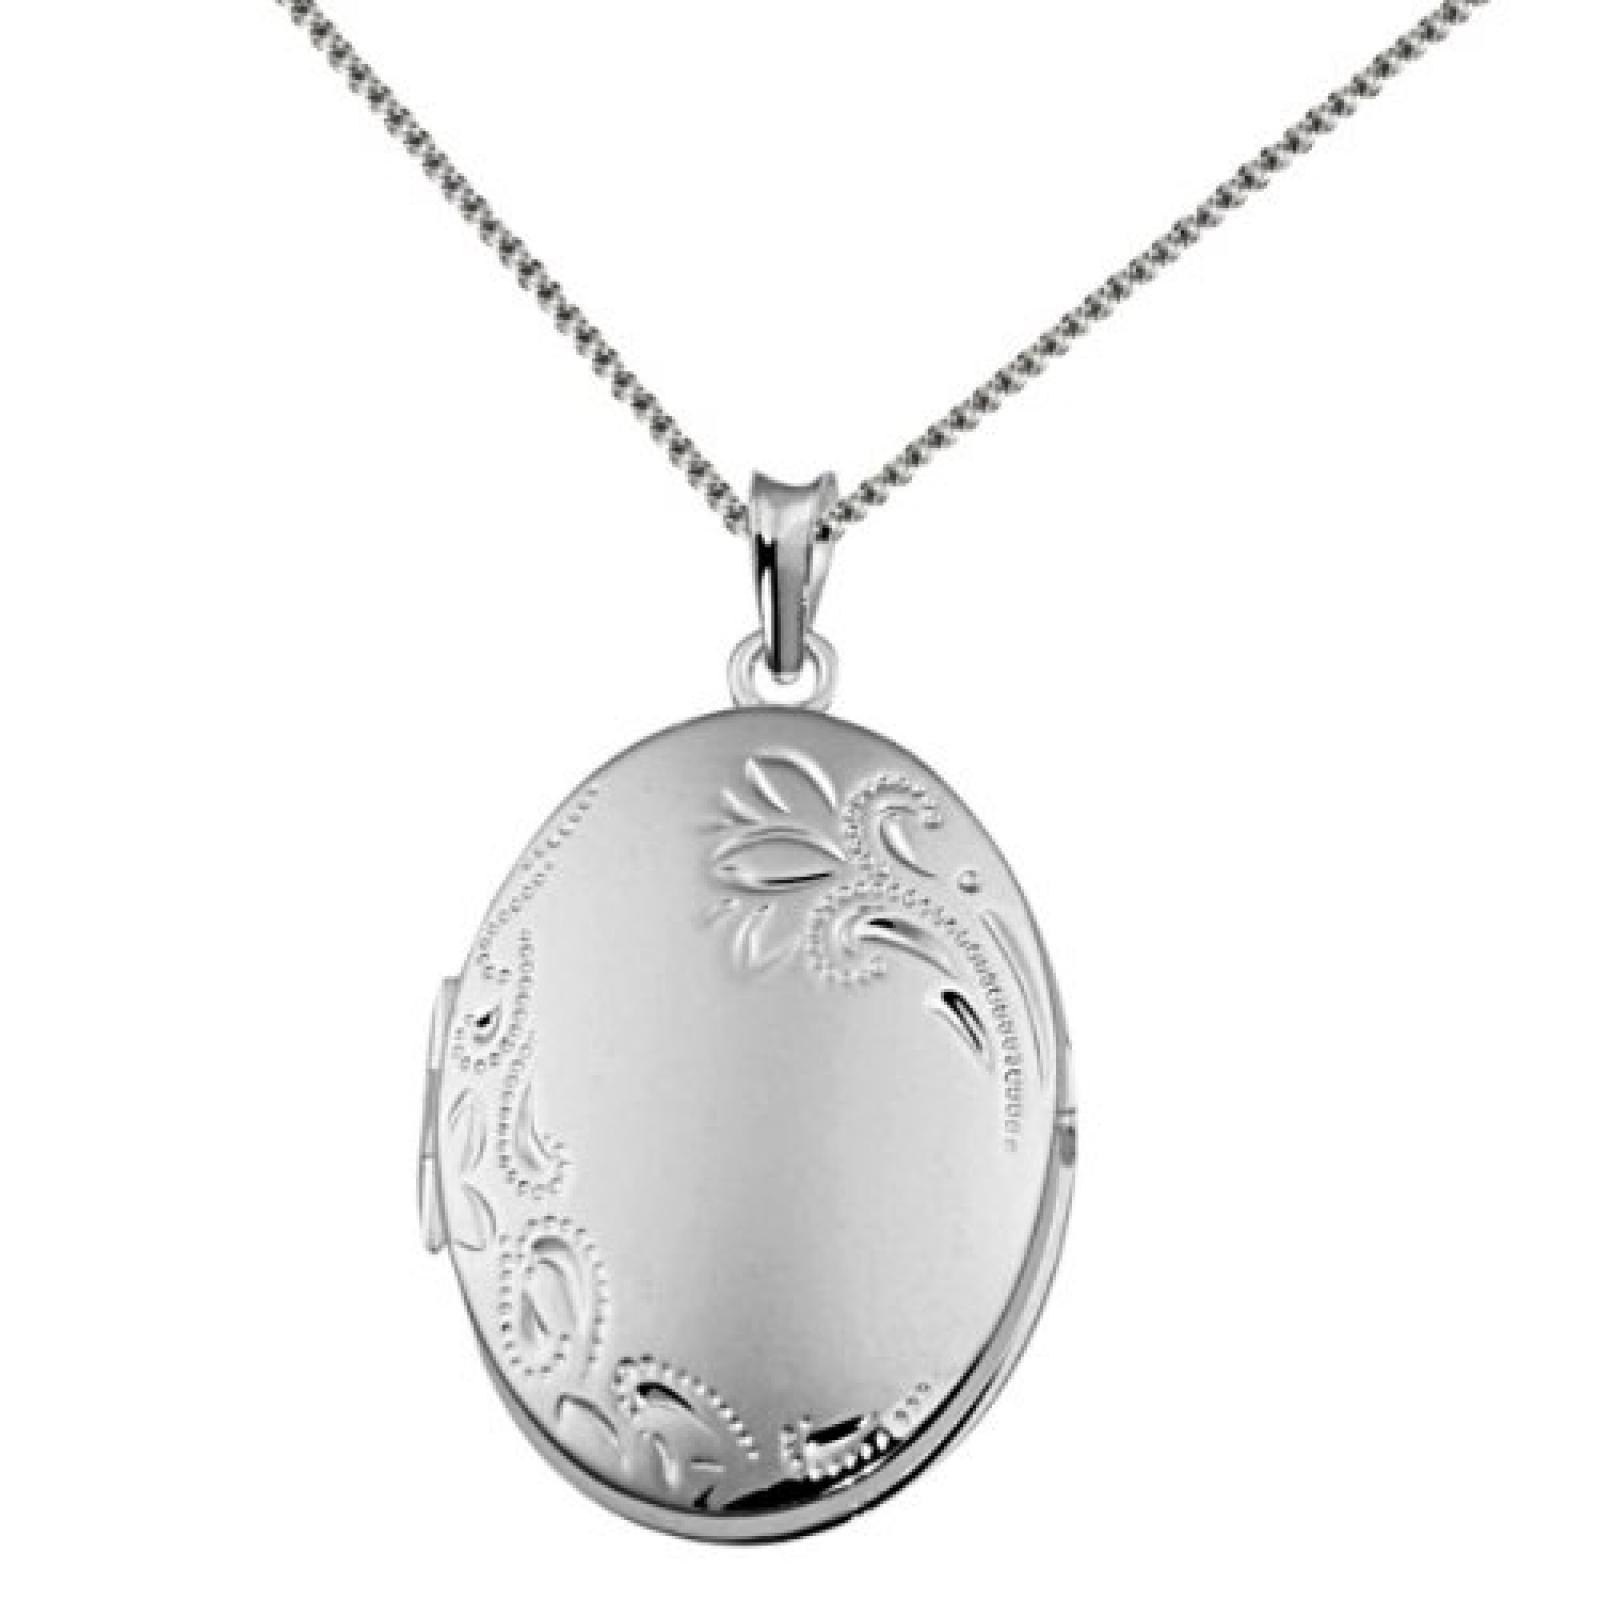 Goldmaid Damen-Halskette 925 Sterling Silber Medallion Blume 45 cm Fo C3405S